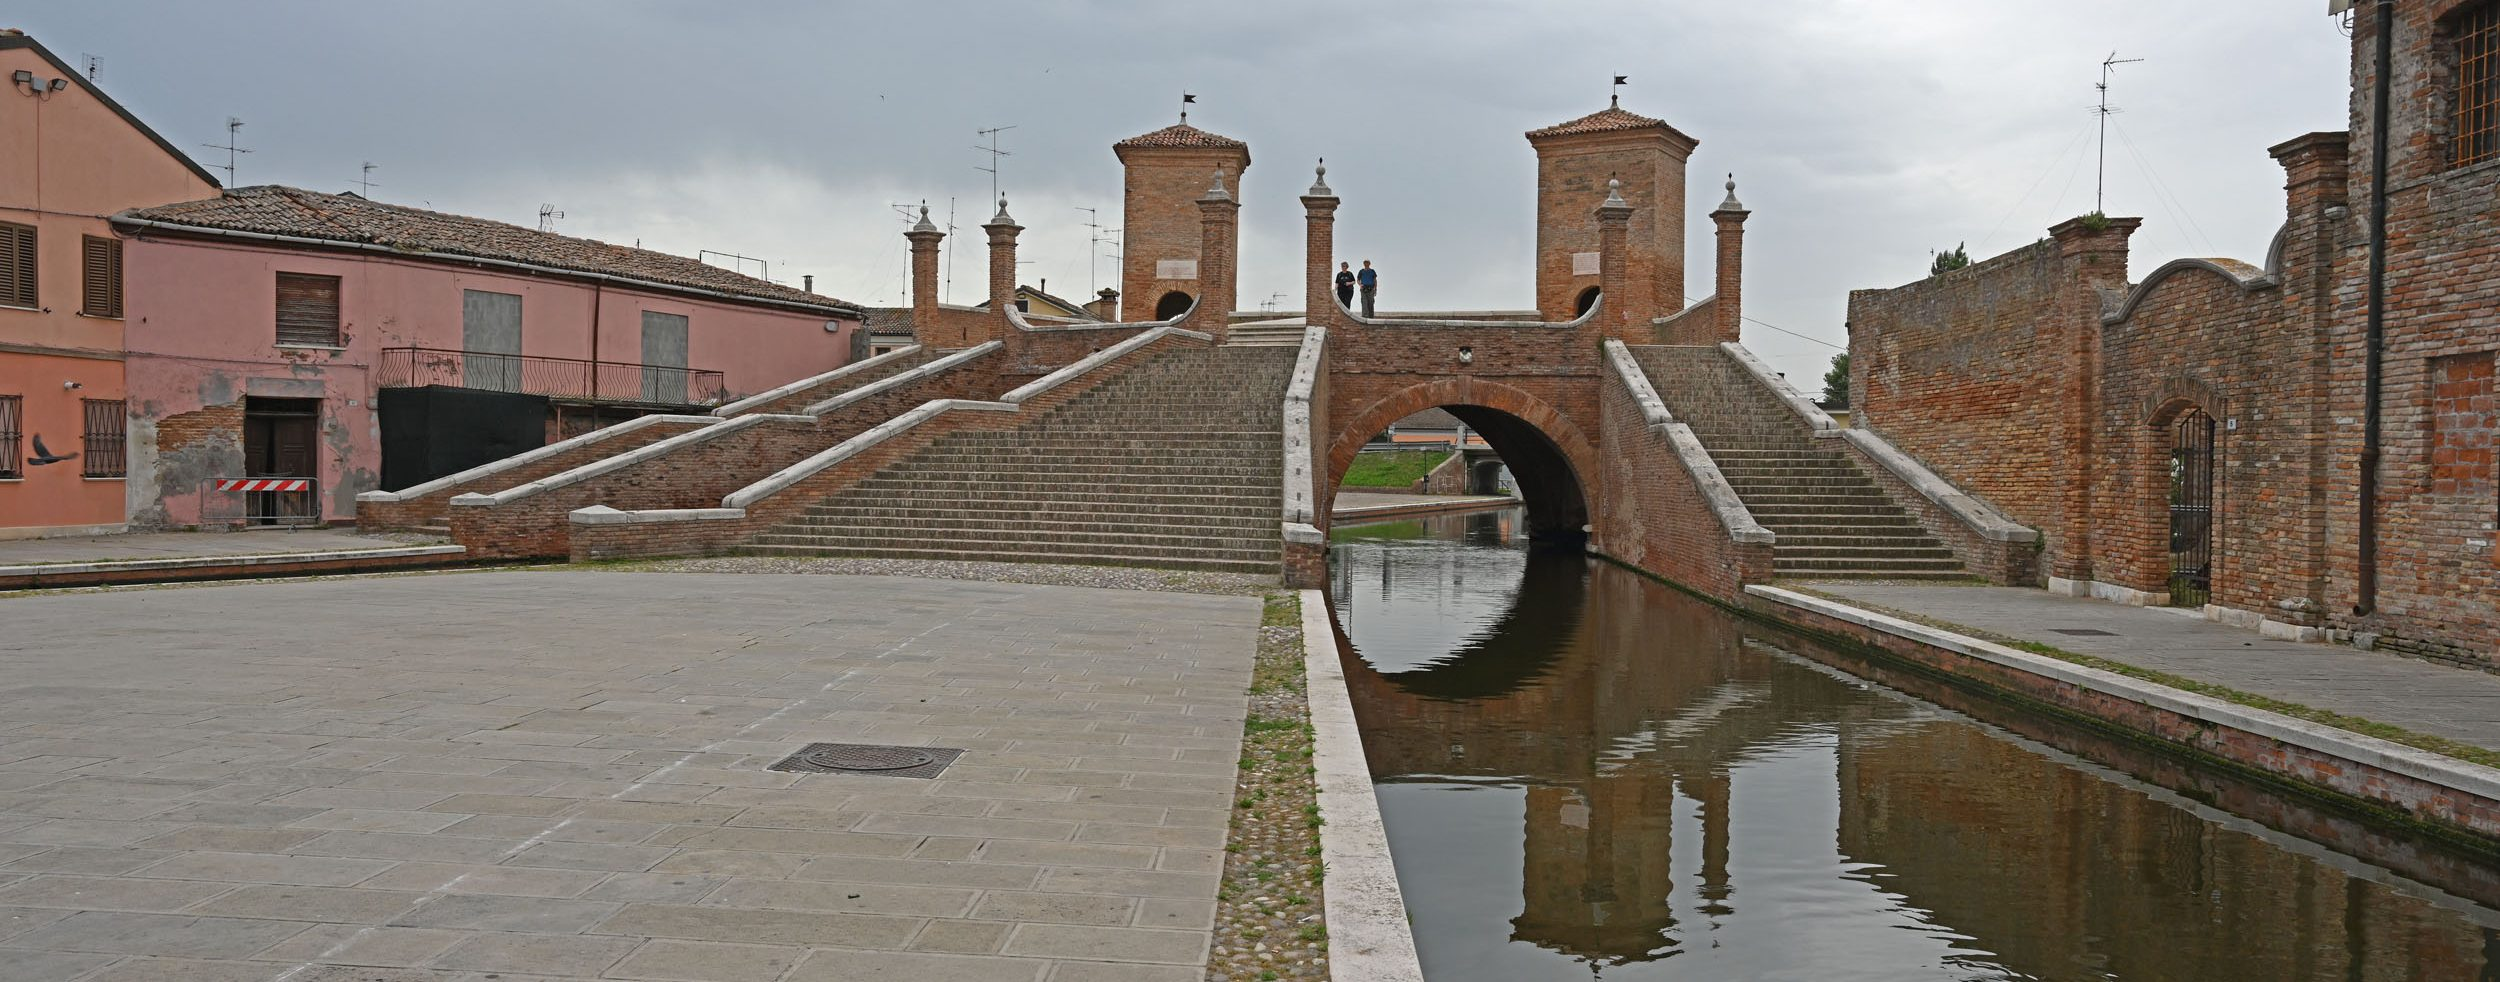 Brücke mit Treppen